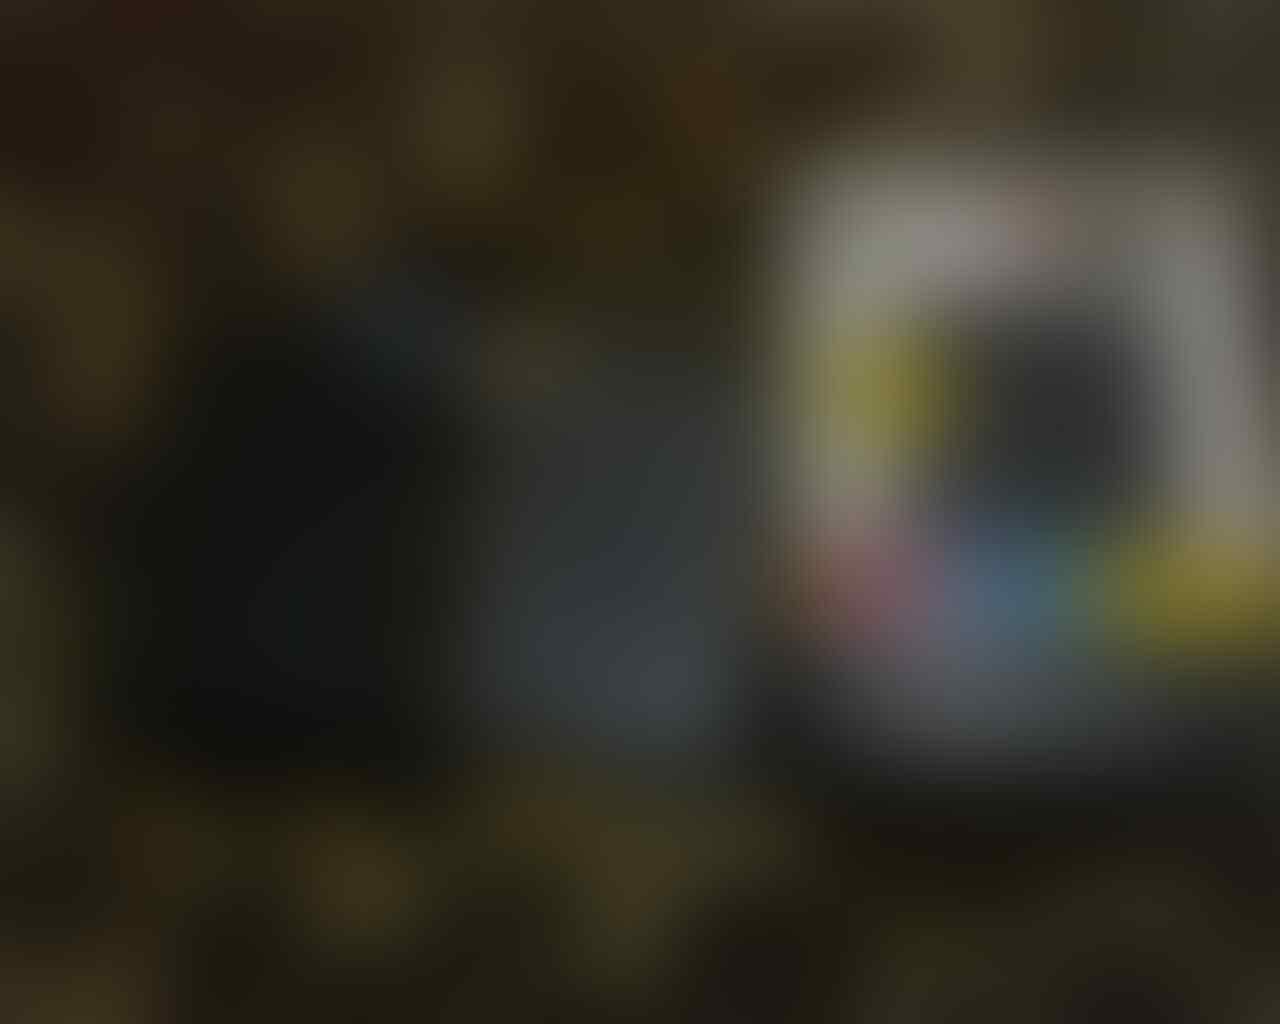 HDD eksternal 500GB WD Elements